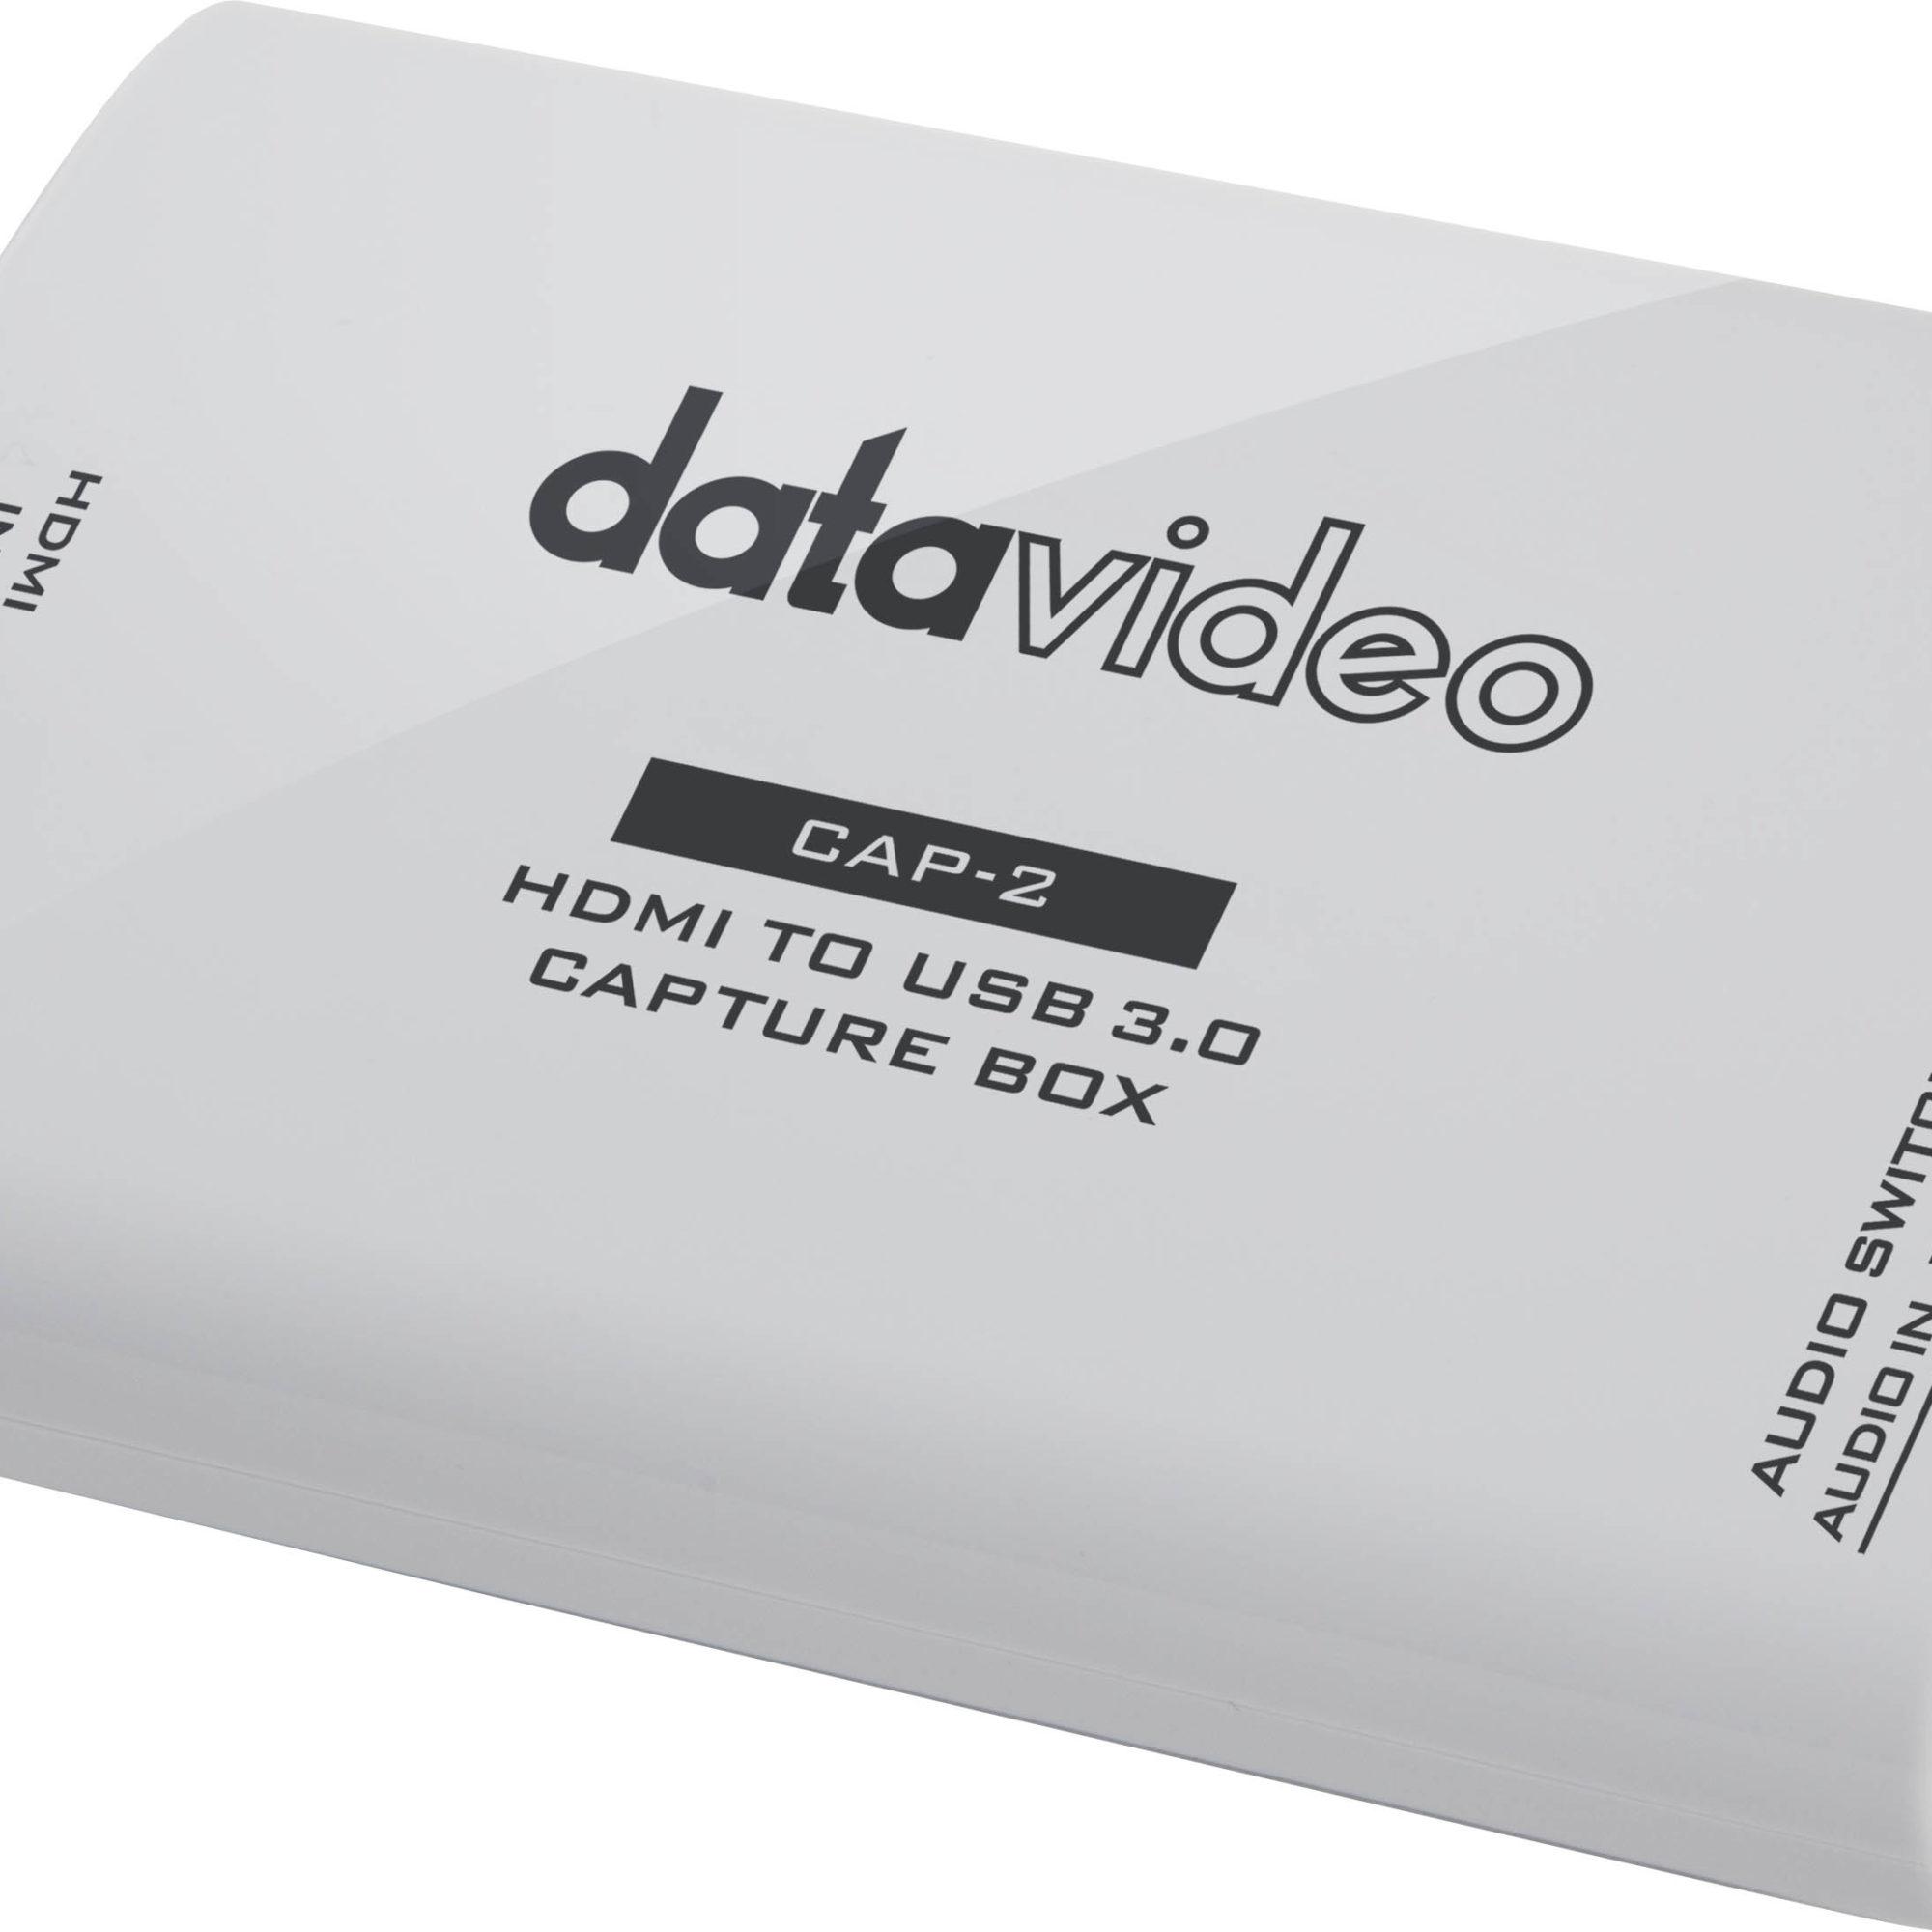 CAP-2 datavidéo